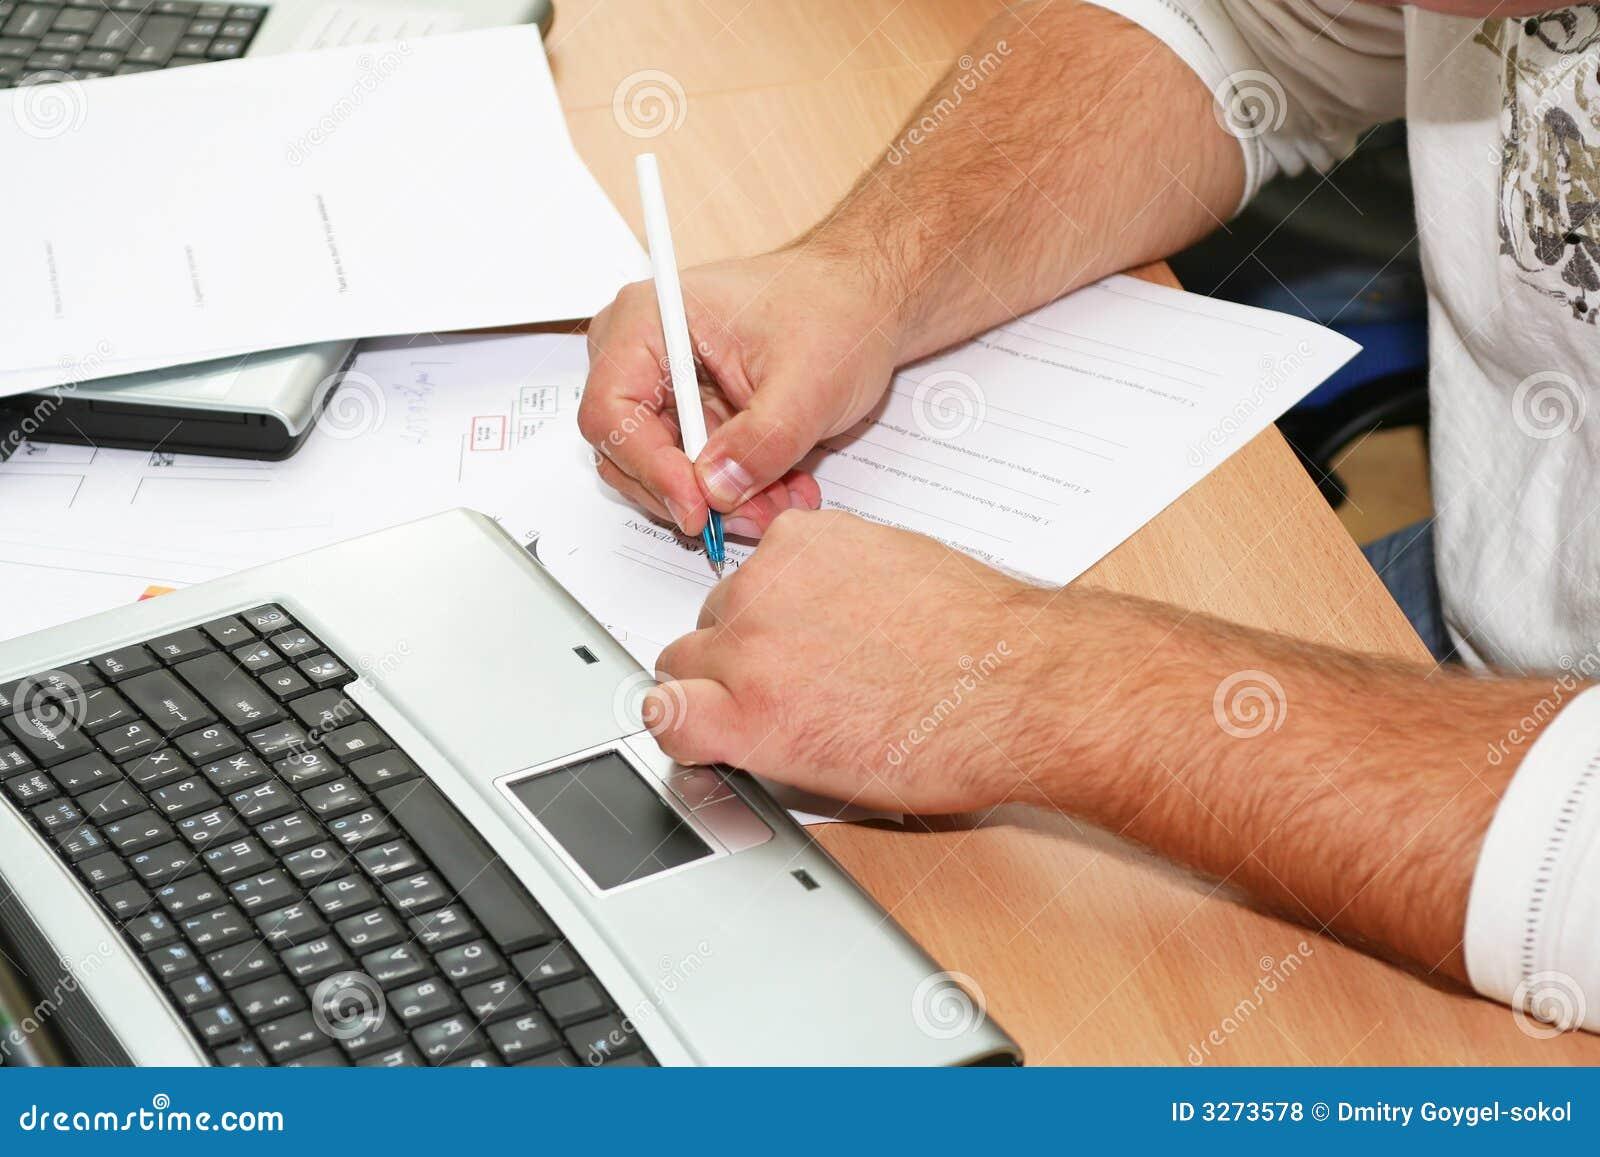 College Admission Essays Online